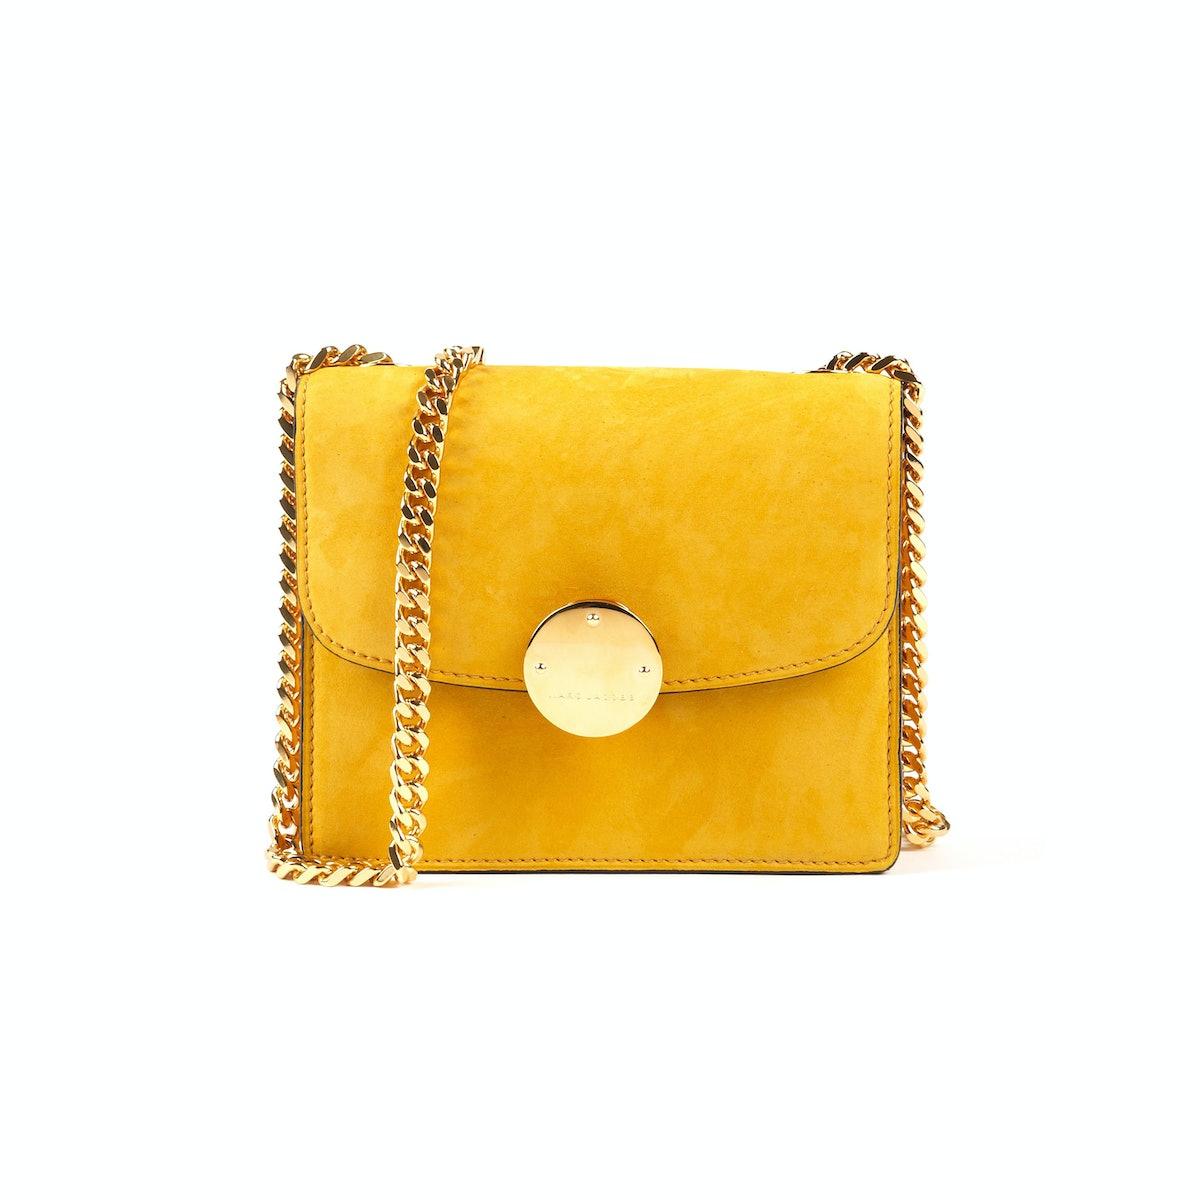 Yellow Marc Jacobs bag